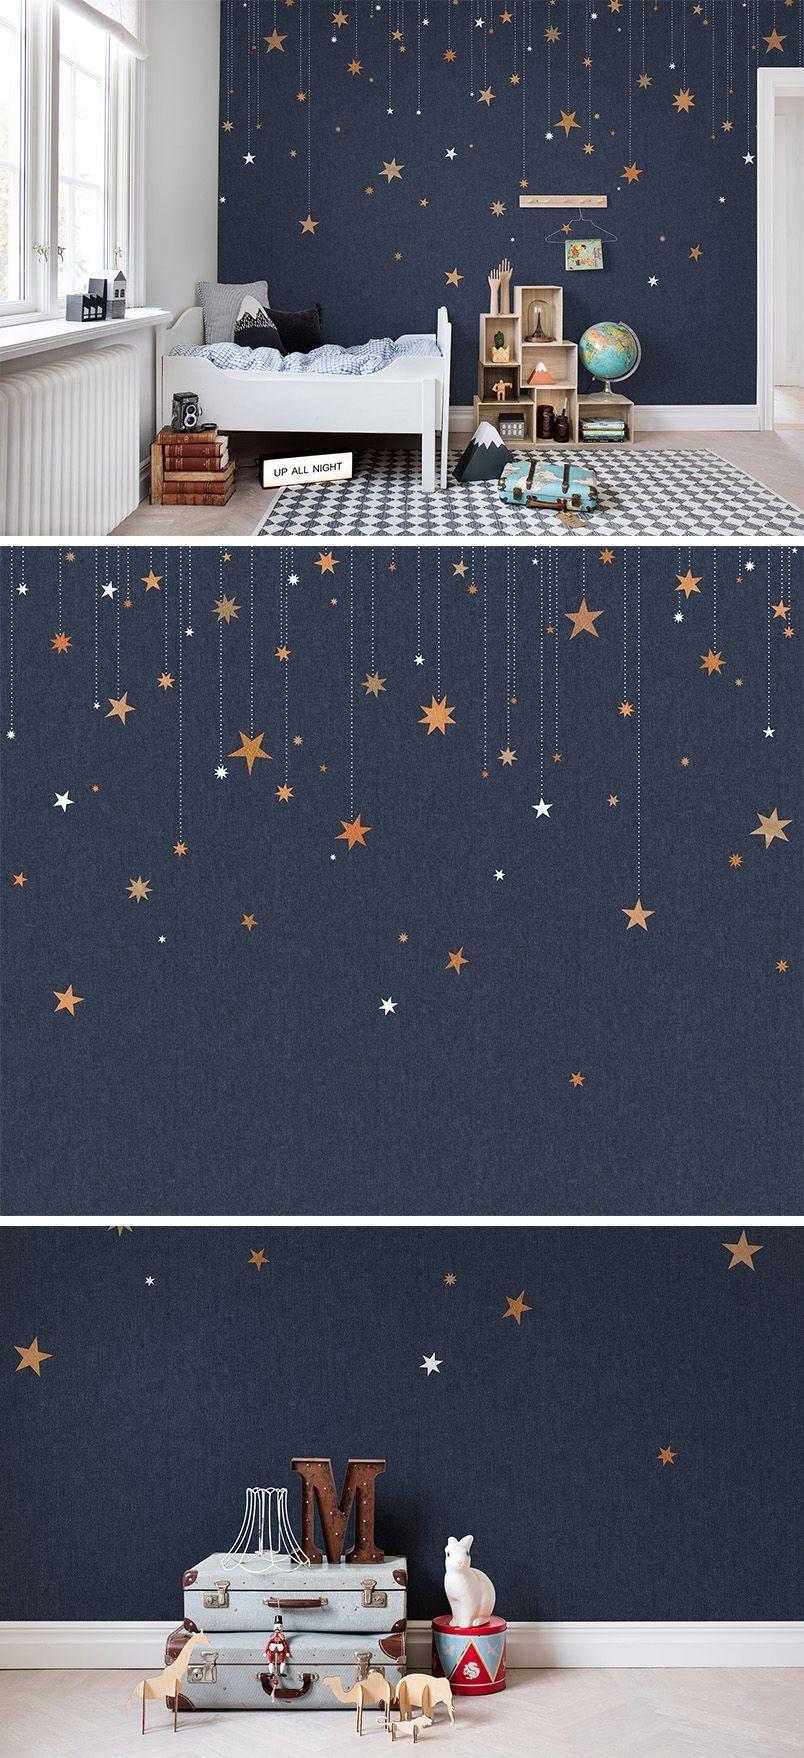 Interior design of children's bedroom wallpaper  wall mural  interior design  kidsu room  nursery